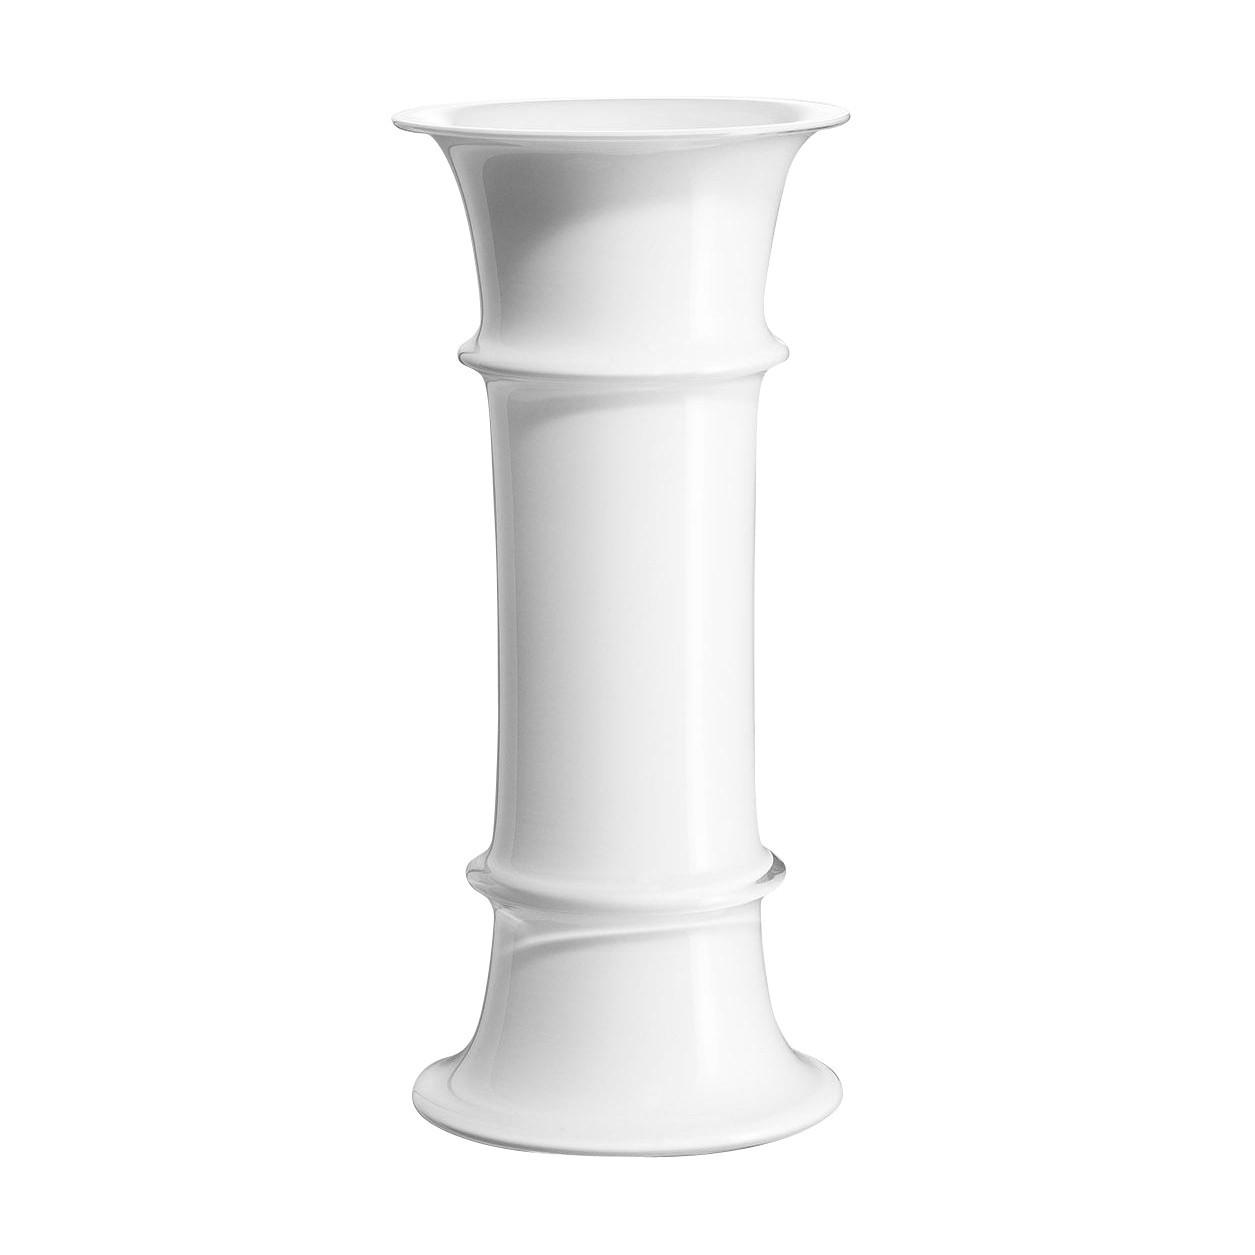 Holmegaard Mb Vase Ambientedirect